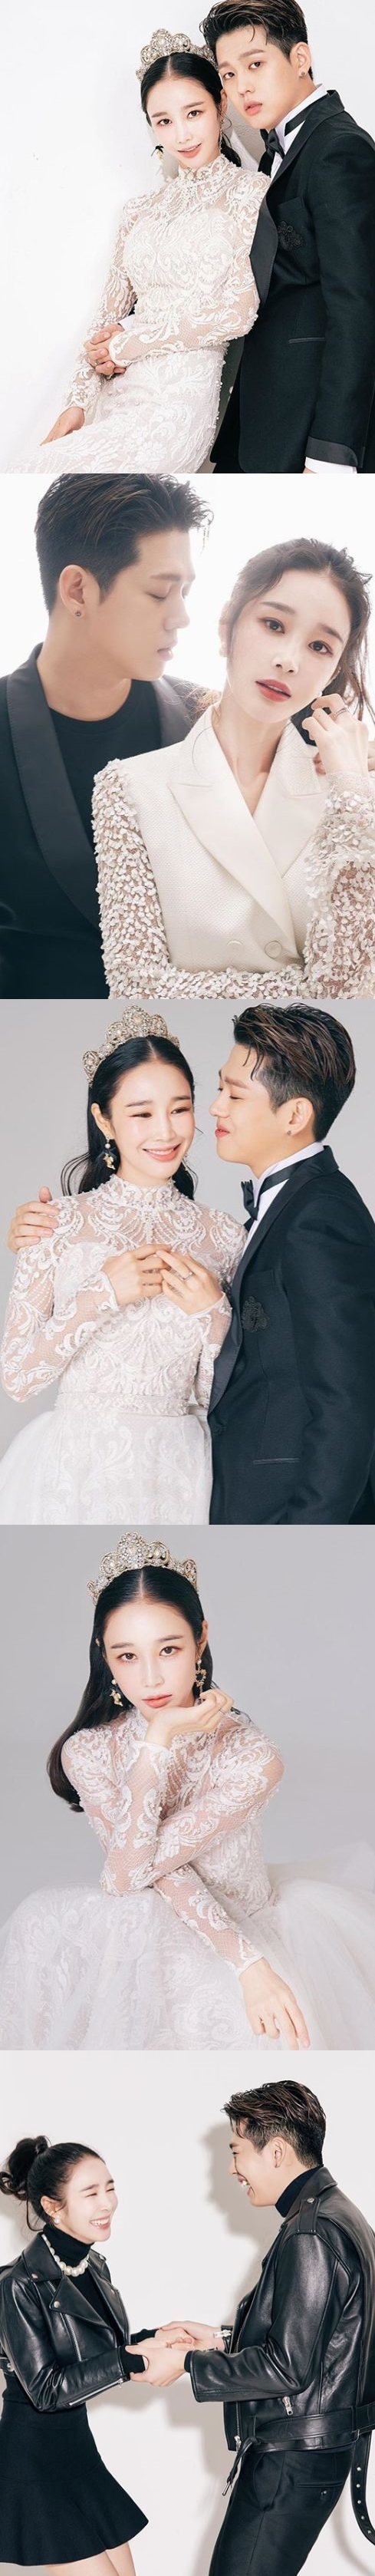 [N샷] 이사강♥론, 11세 연상연하 맞아? 눈부신 웨딩화보 공개